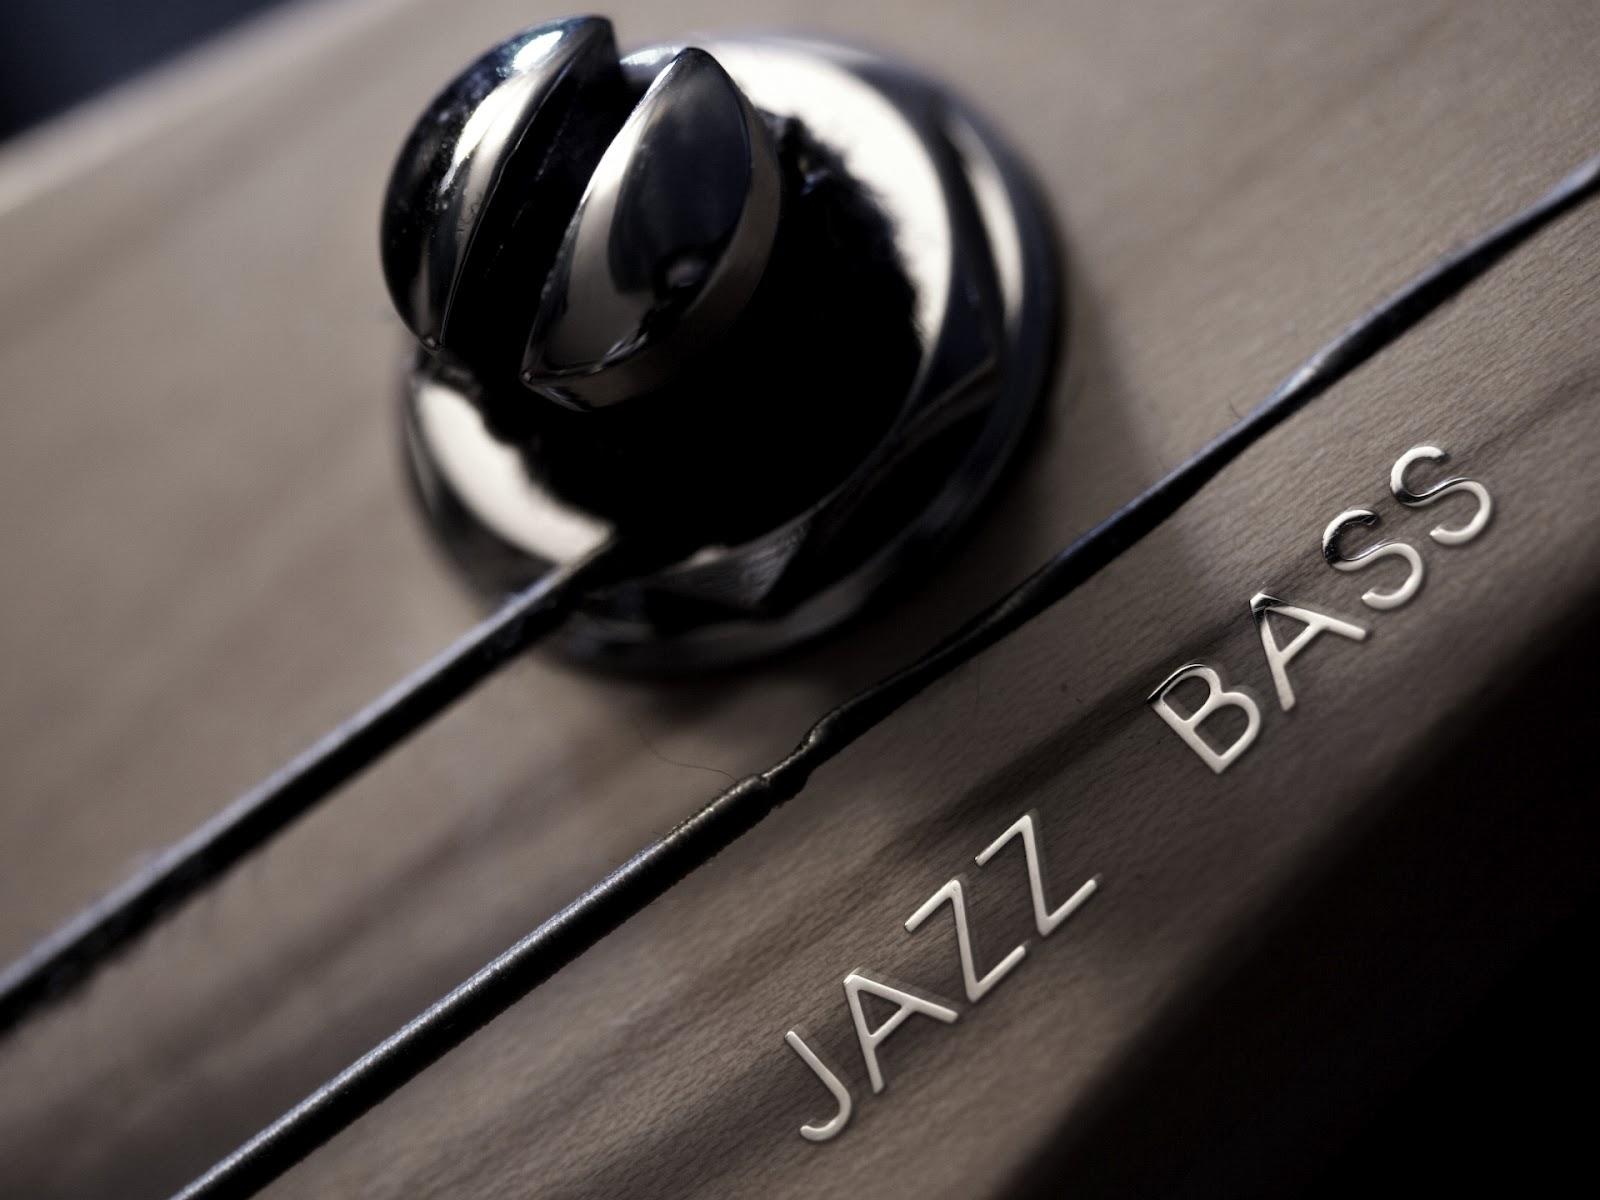 http://2.bp.blogspot.com/-W2ENJR5obOs/UBWMayQtwzI/AAAAAAAAE1Q/APYN_WHowQA/s1600/jazz-bass-wallpaper.jpeg